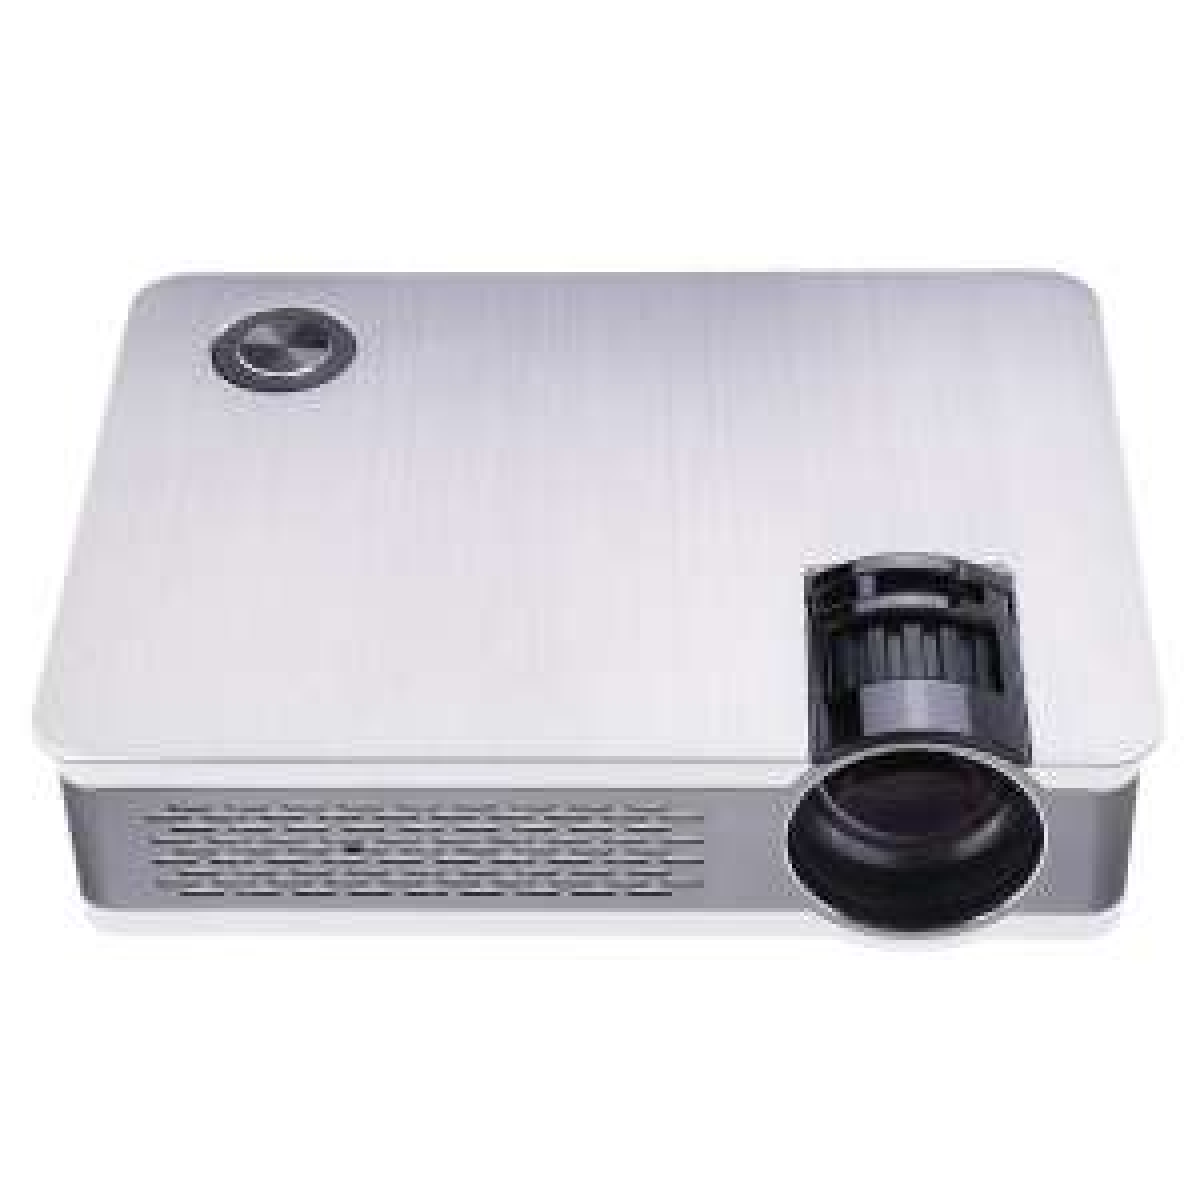 Projecteur LED AUN Akey5 - Full HD 1080p, 3 800 Lumens, Gris